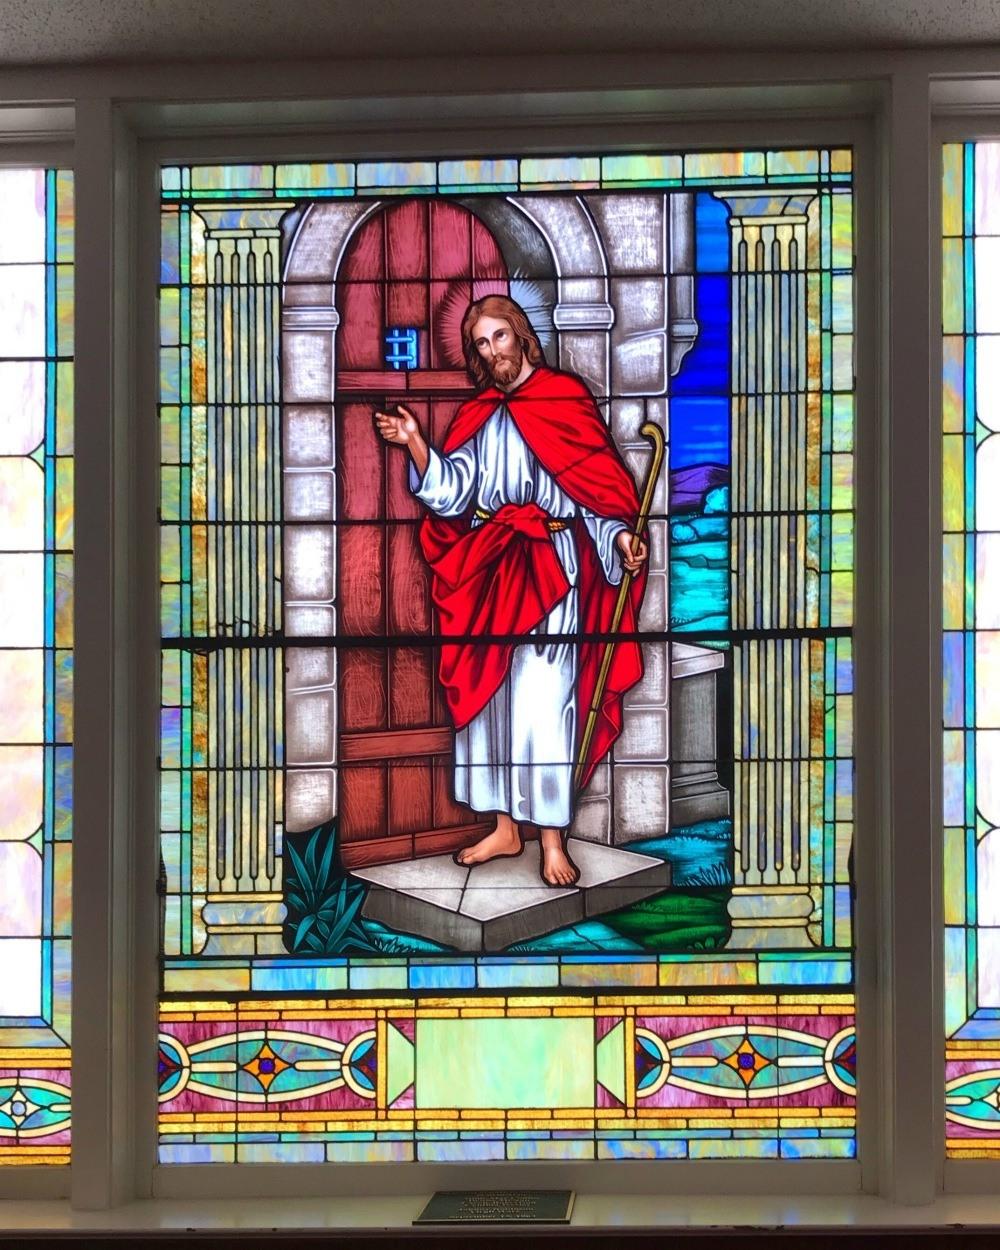 Stained glass in 16th St Baptist Church, Birmingham, Alabama Photo Heatheronhertravels.com